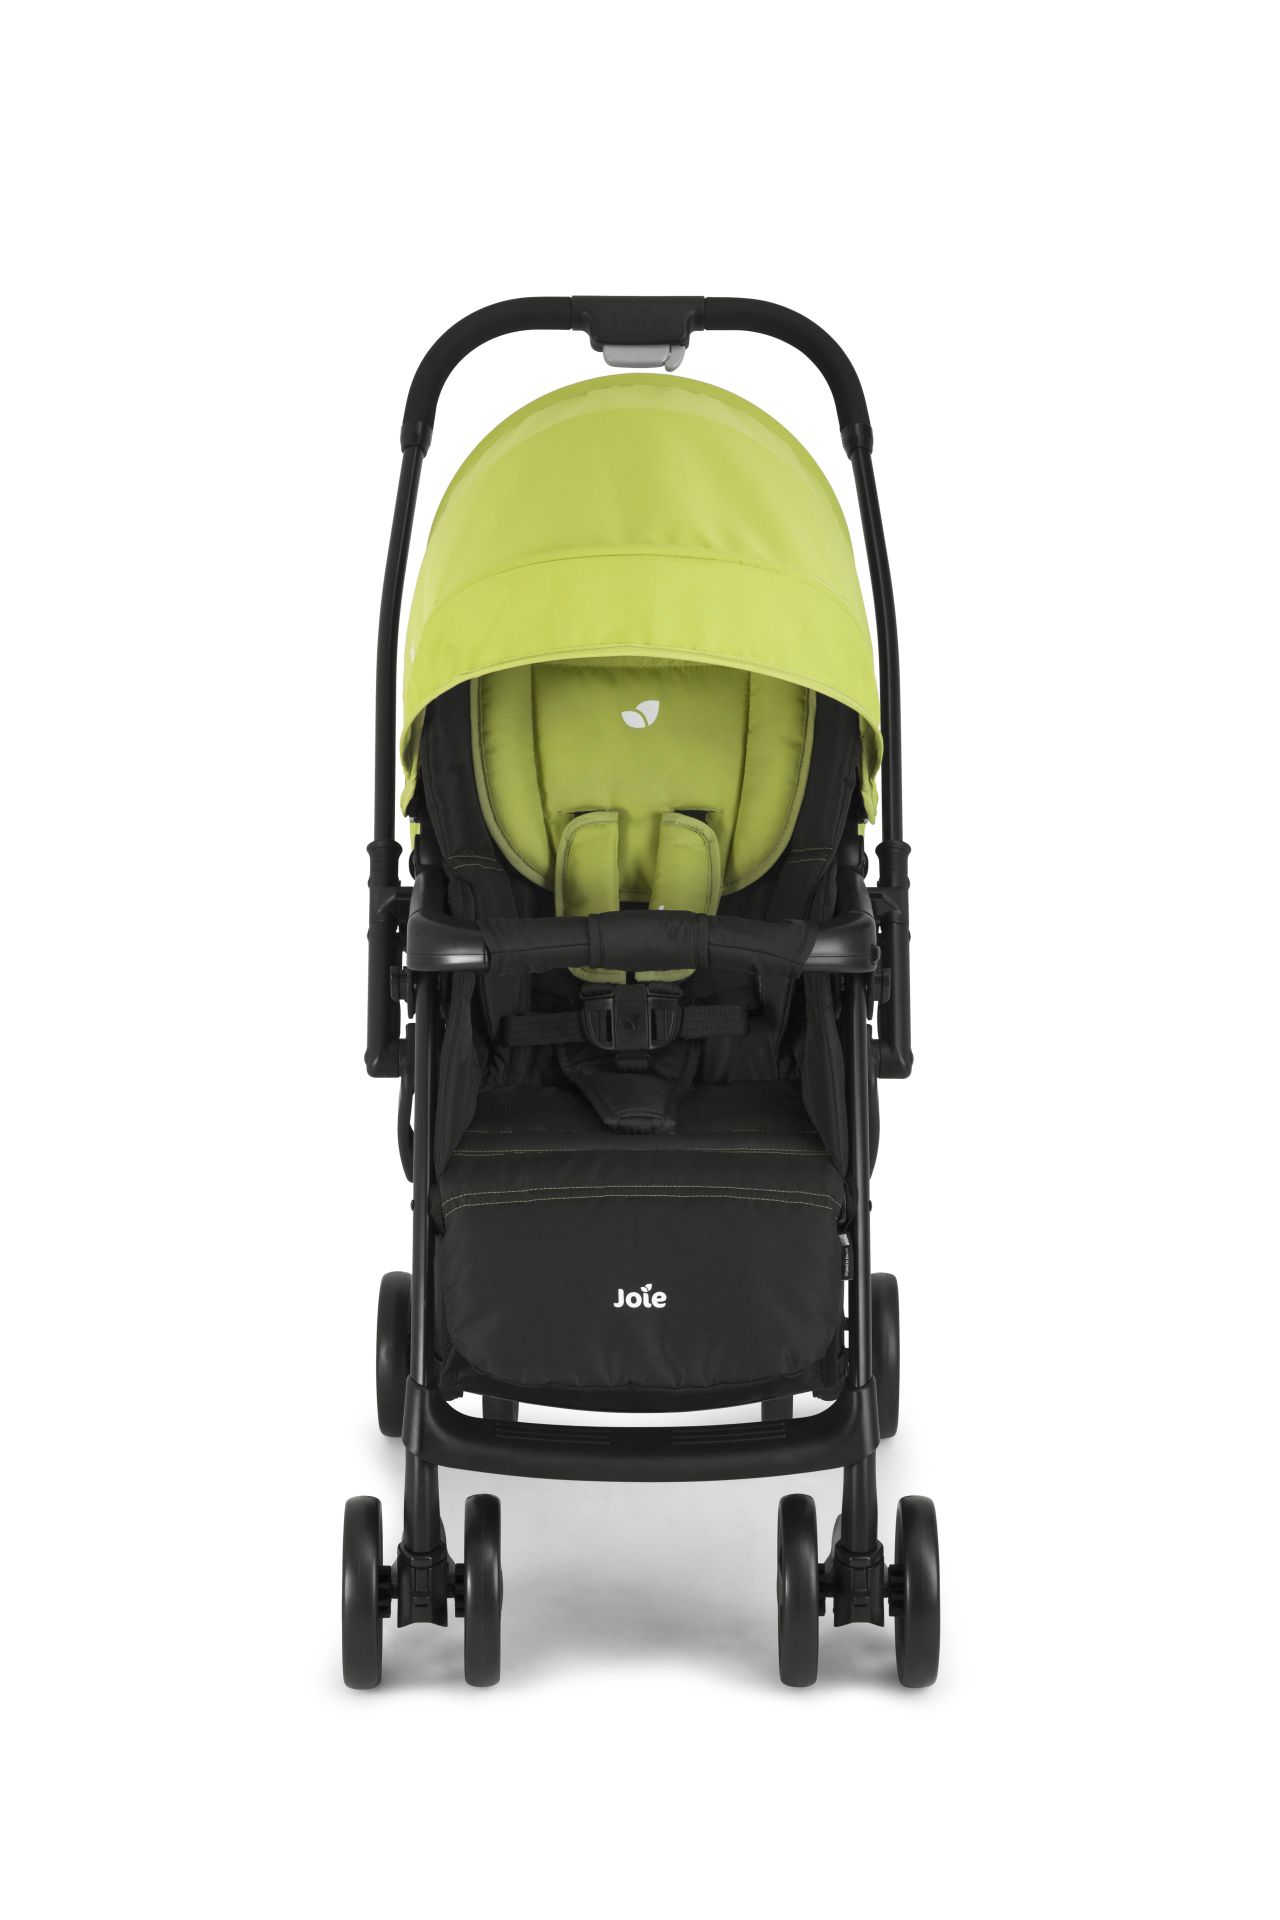 Joie Buggy Mirus™ 2017 Citron - Buy at kidsroom | Strollers